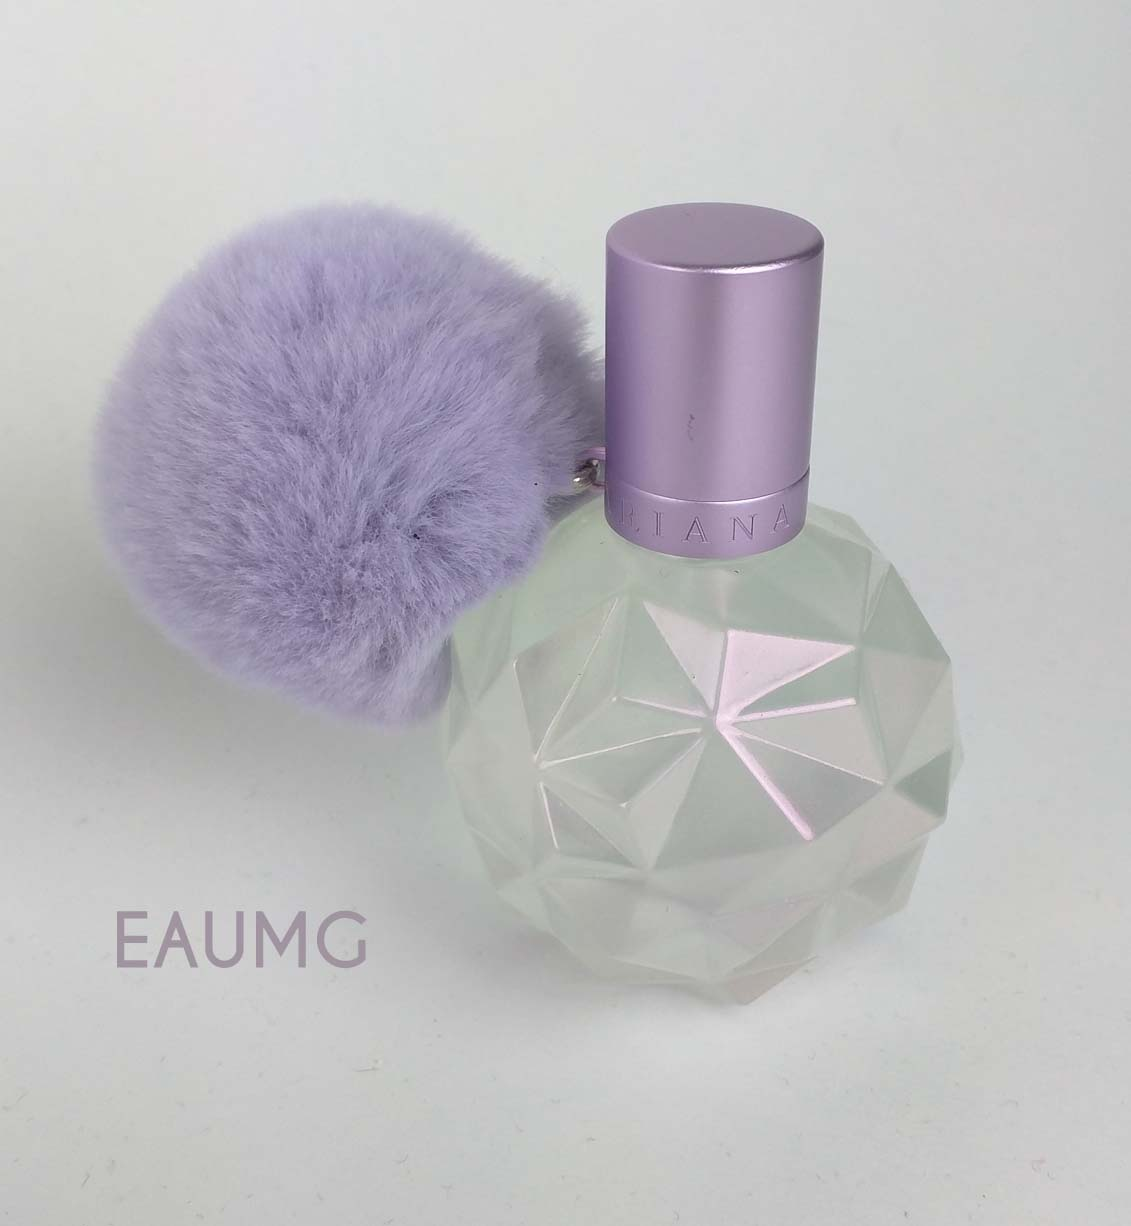 Ariana Grande Moonlight Perfume Review Eaumg